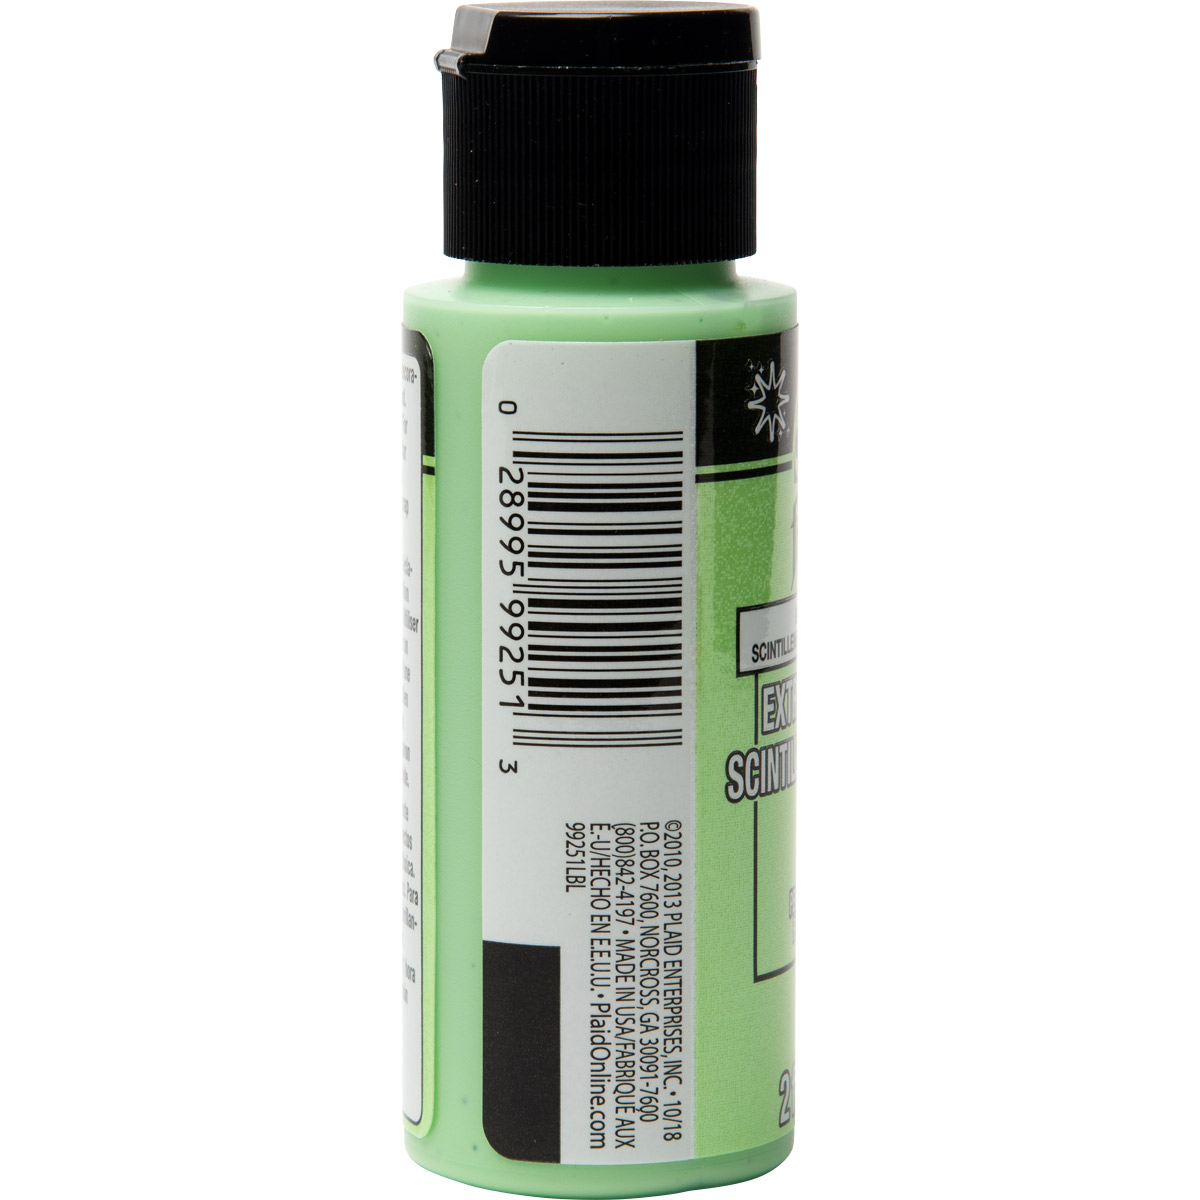 FolkArt ® Extreme Glitter™ - Lime Twinkle, 2 oz. - 99251